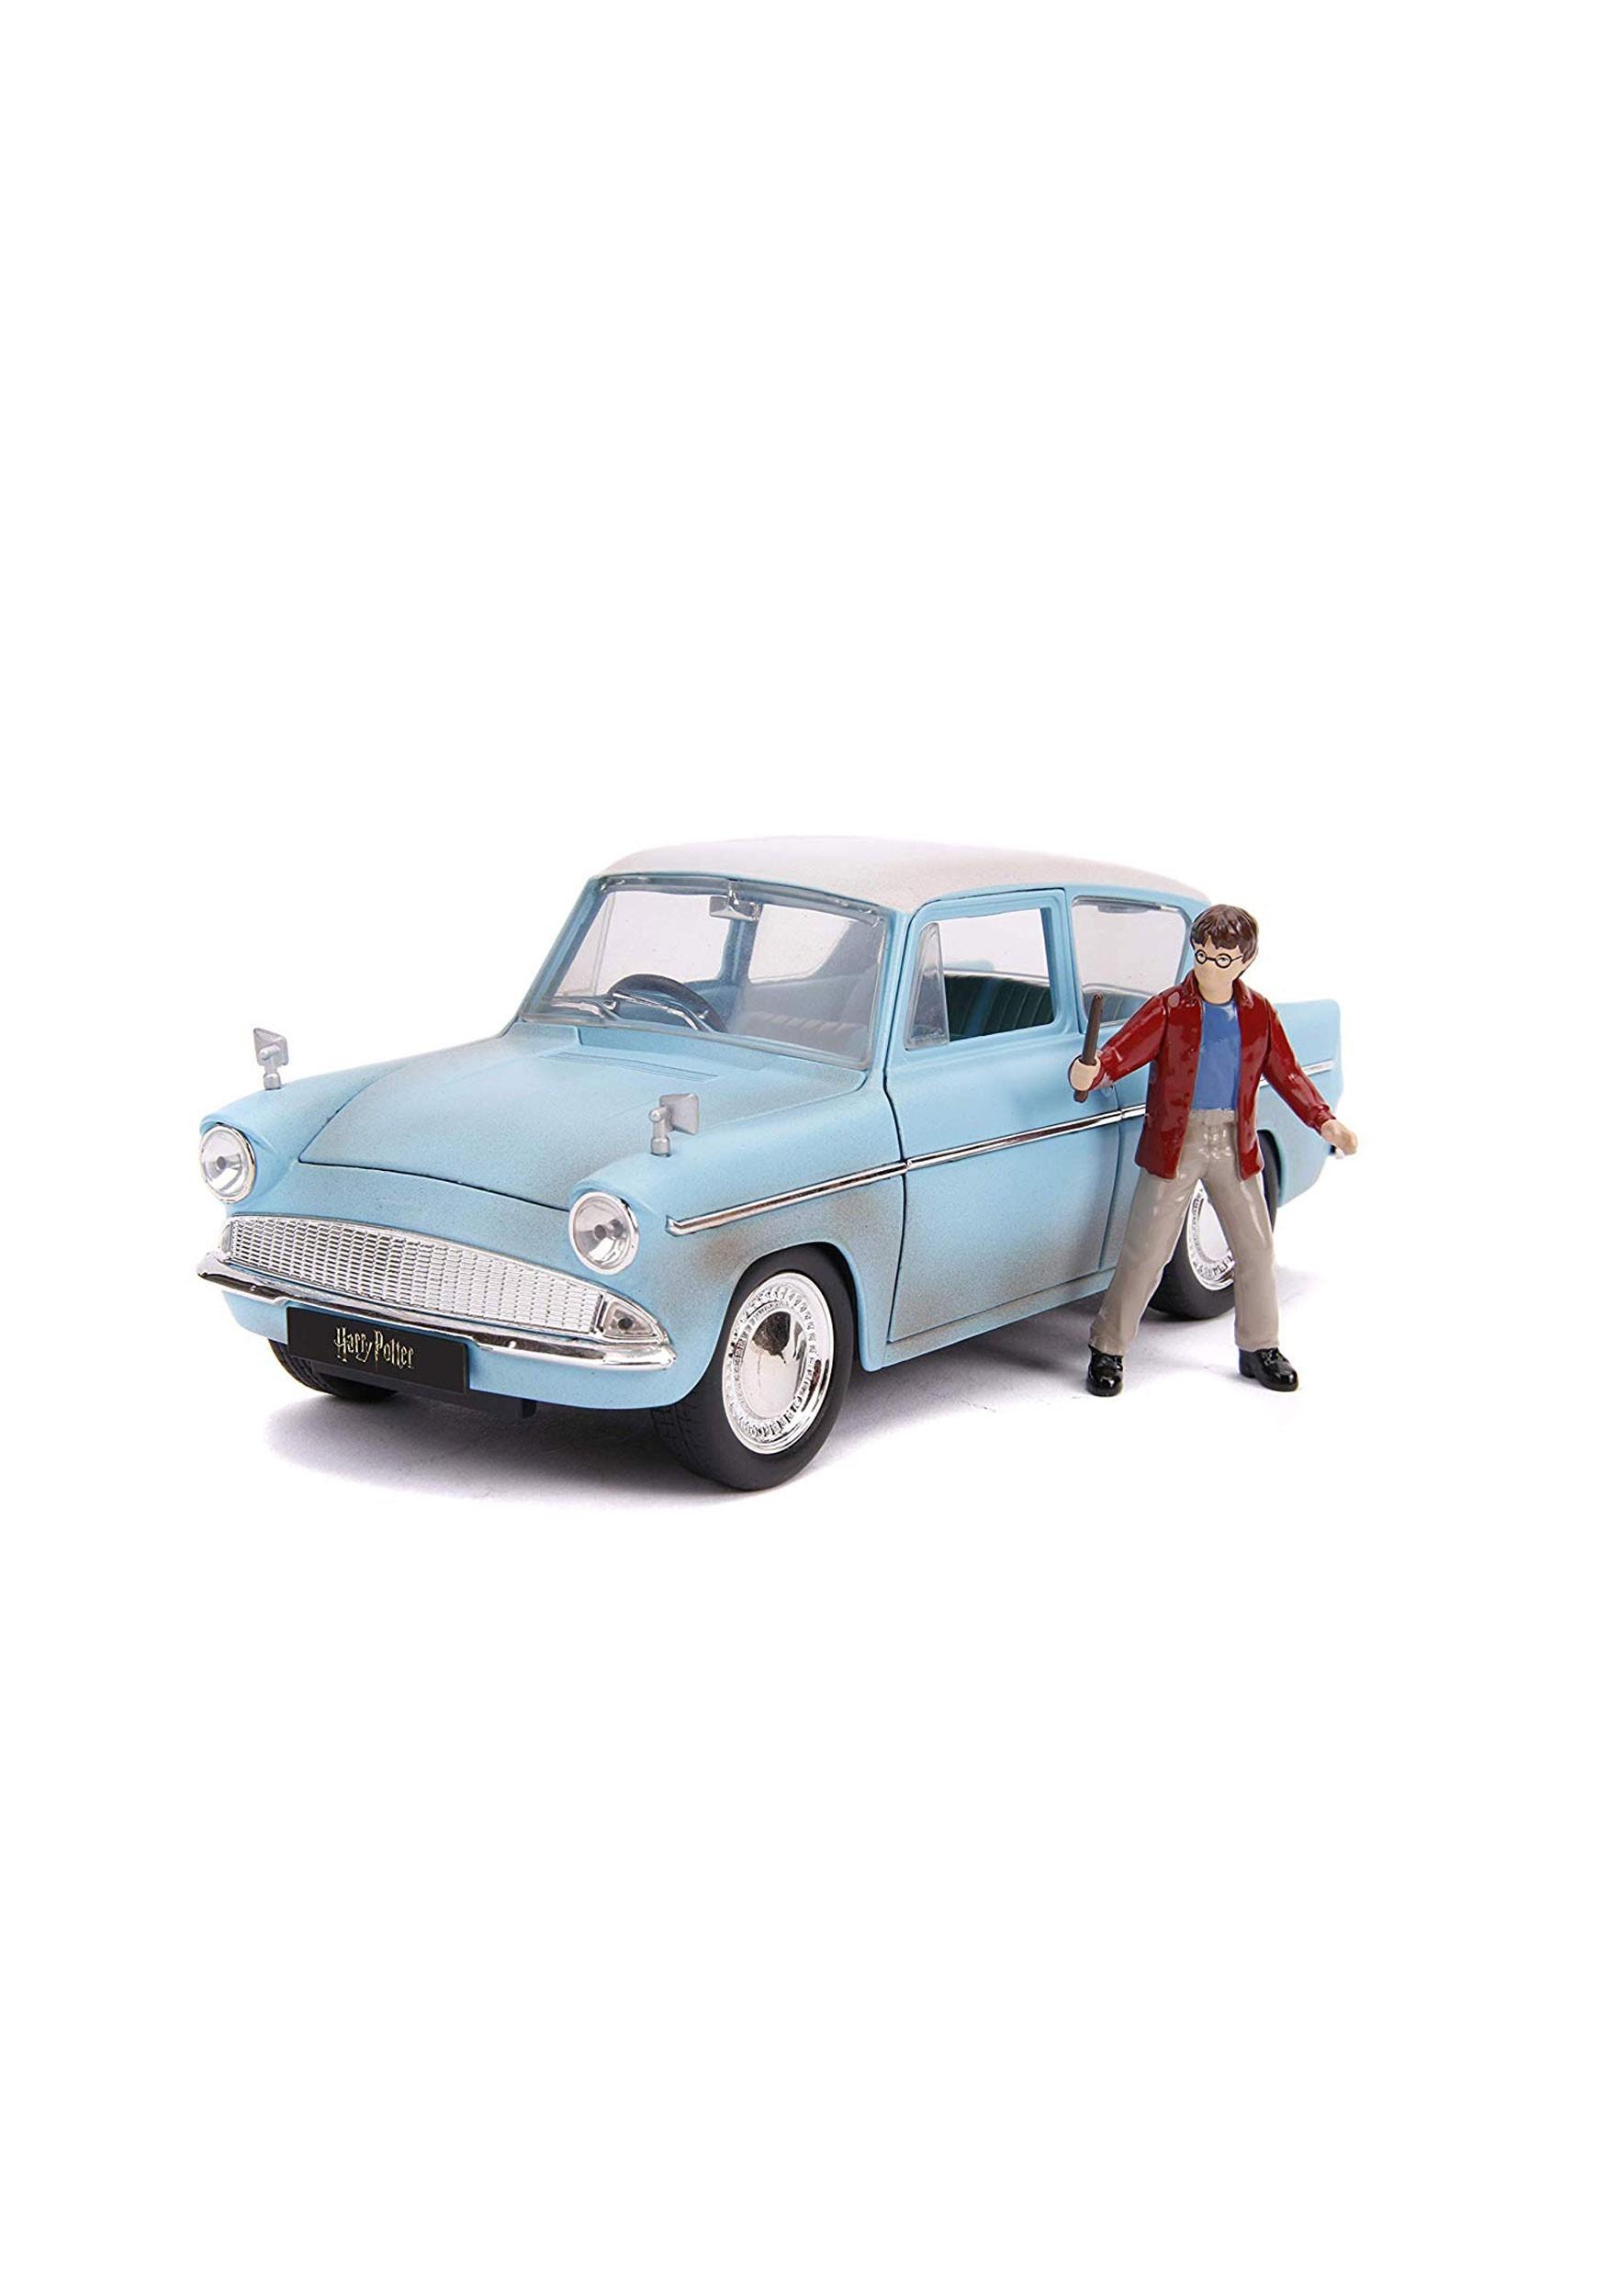 Harry Potter 1959 Ford Anglia 1:24 Scale w/ Figure